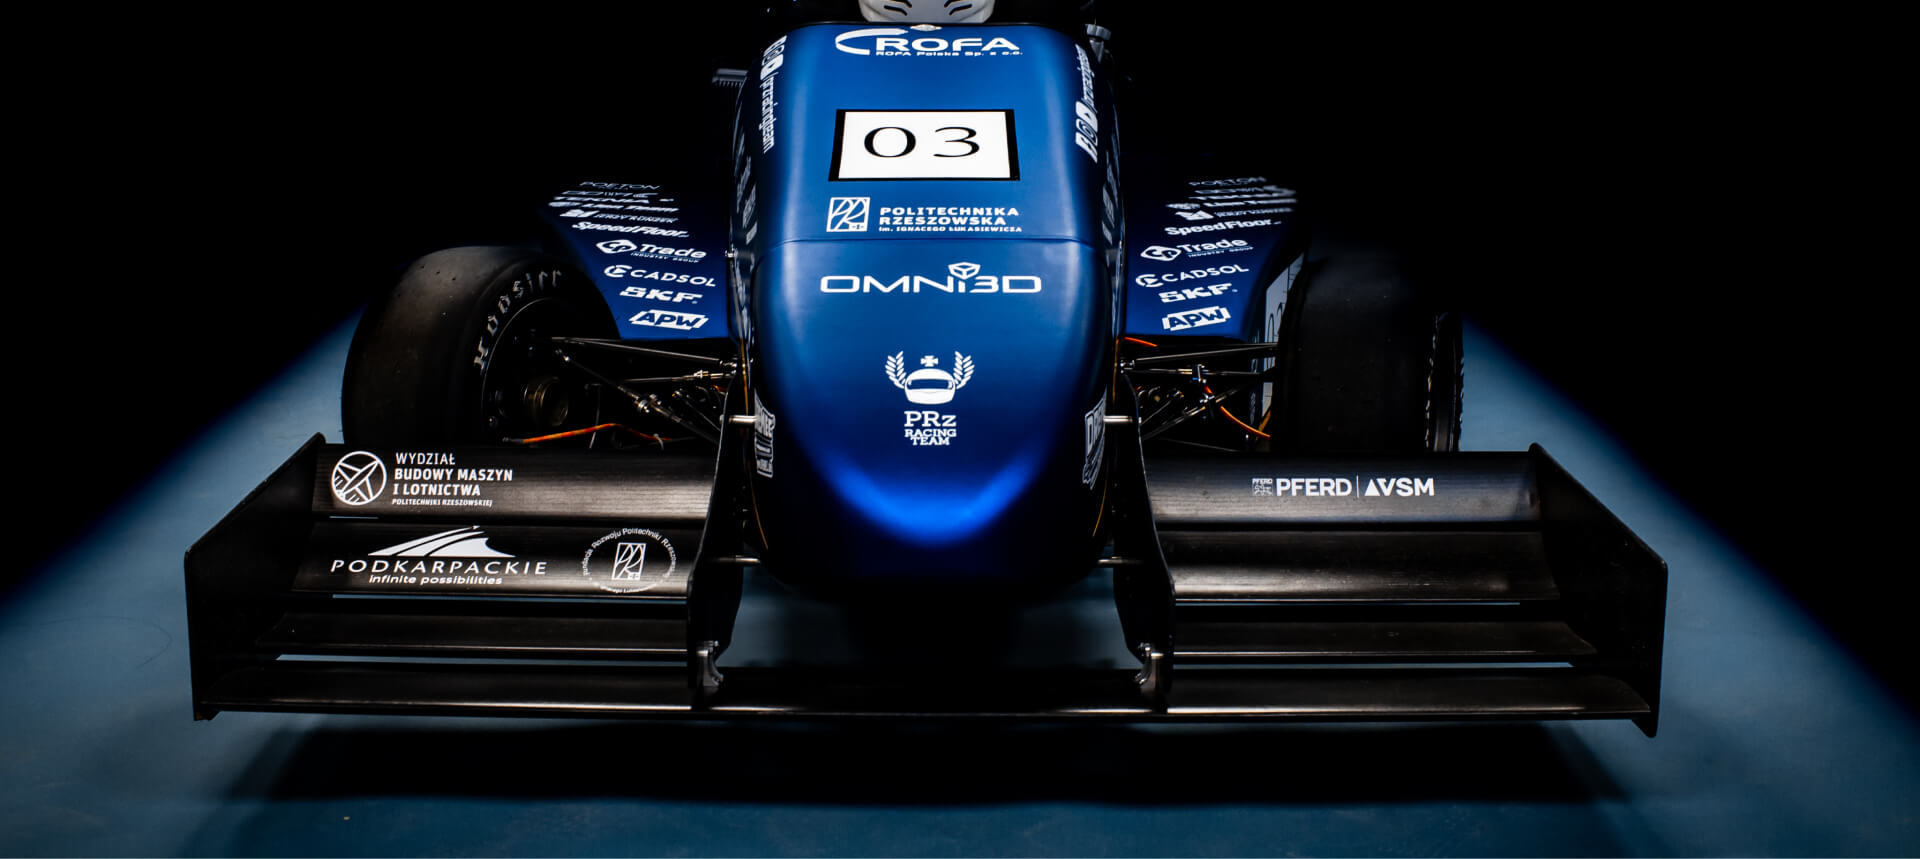 Polish Race Team Gets Lightweight AM Upgrades